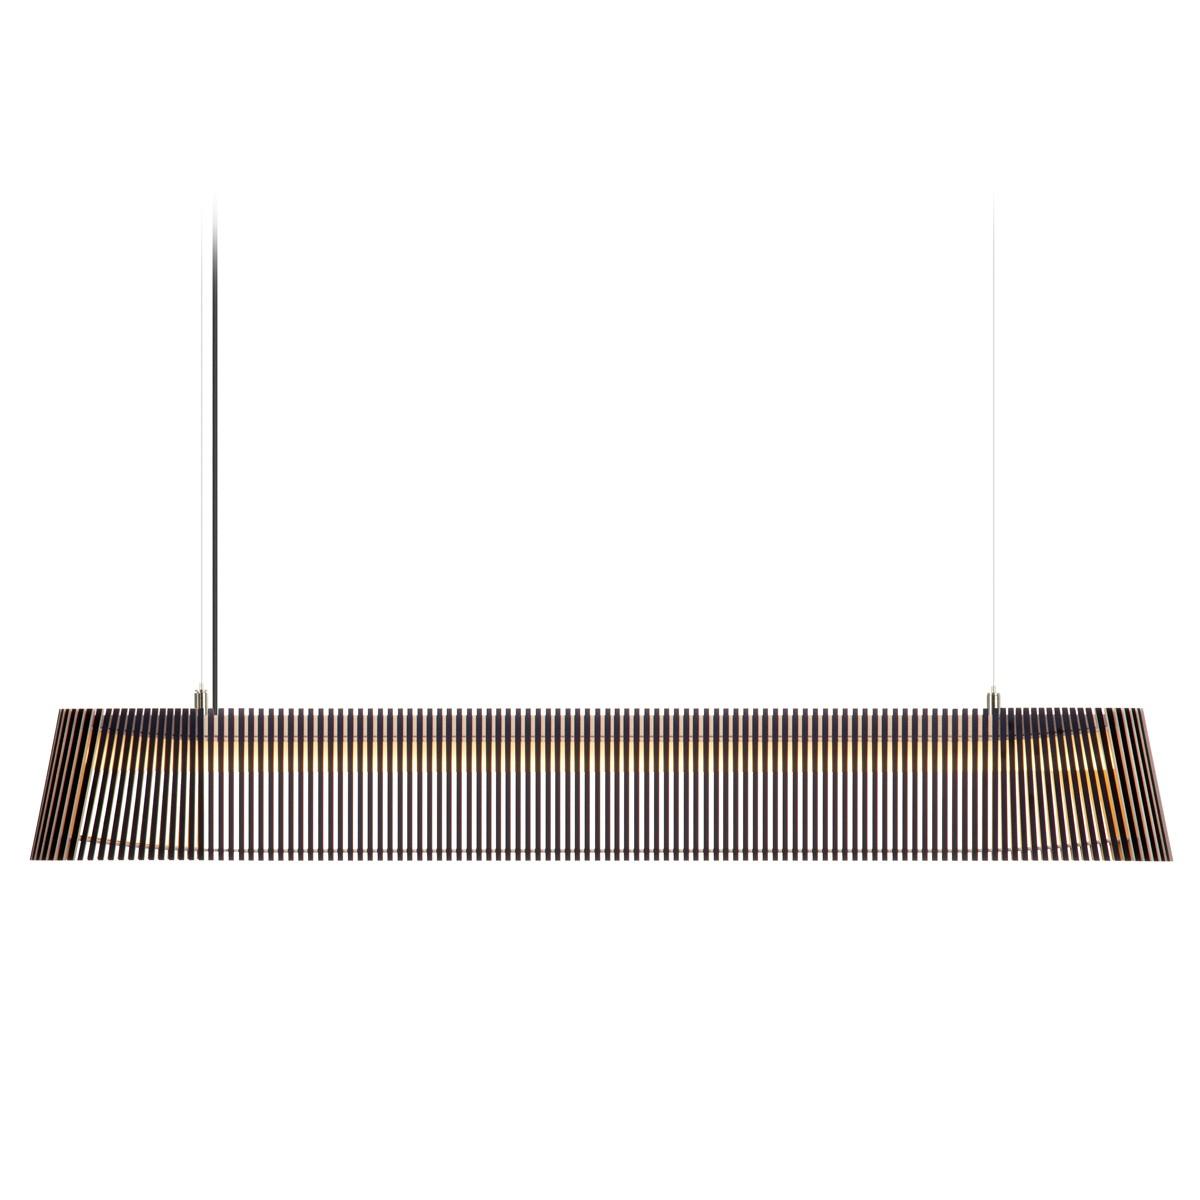 Secto Design Owalo 7000 Pendelleuchte, schwarz laminiert, Kabel: schwarz